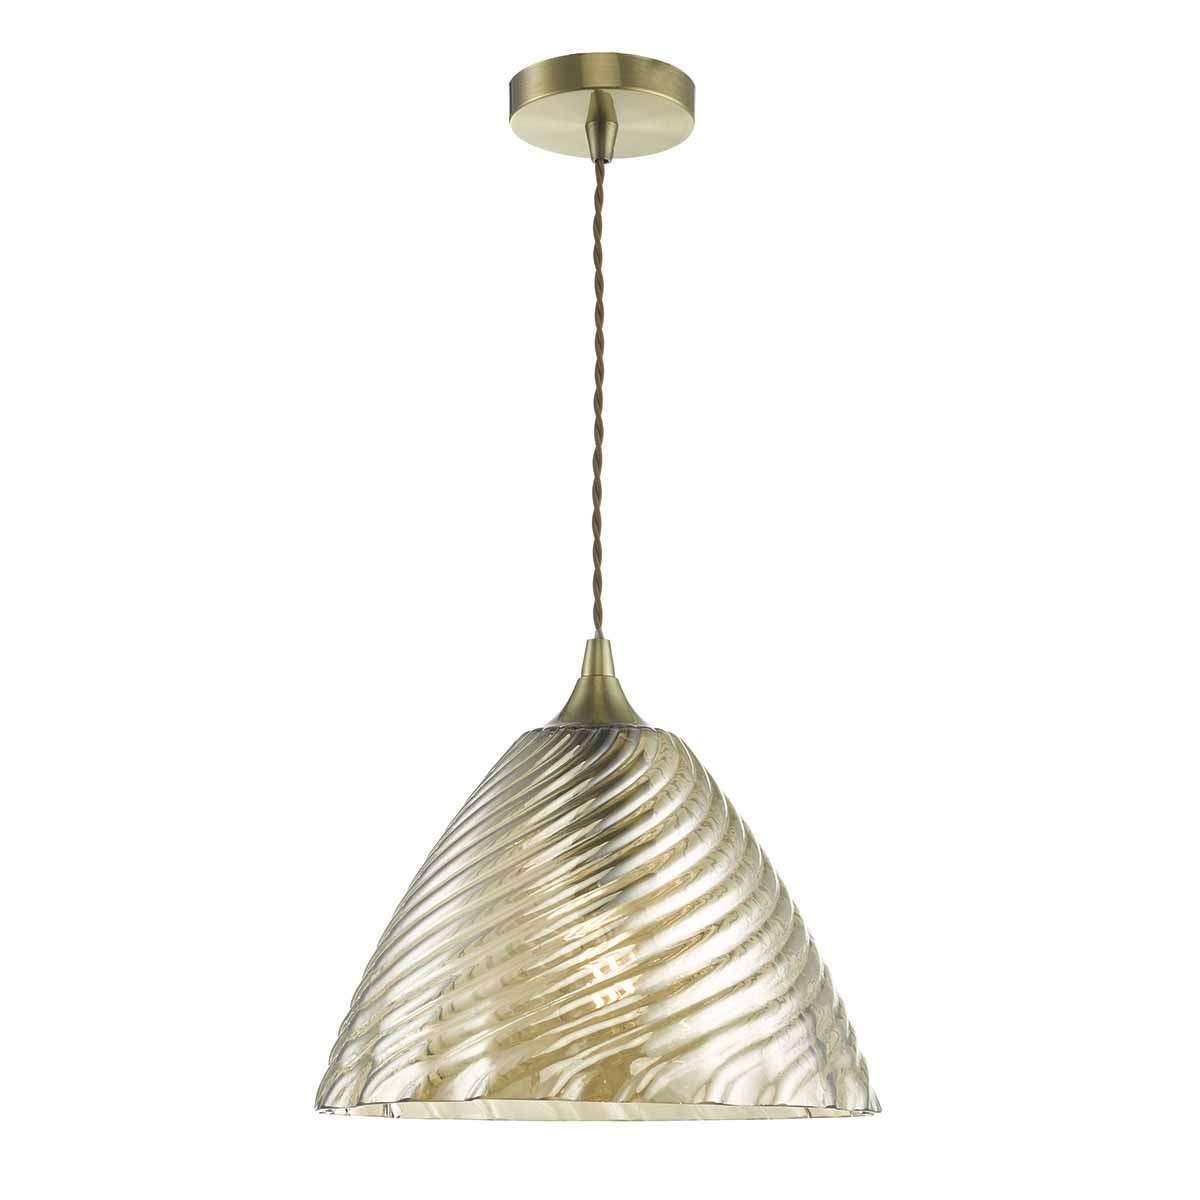 Faye 1lt Pendant Antique Brass & Champagne Gold